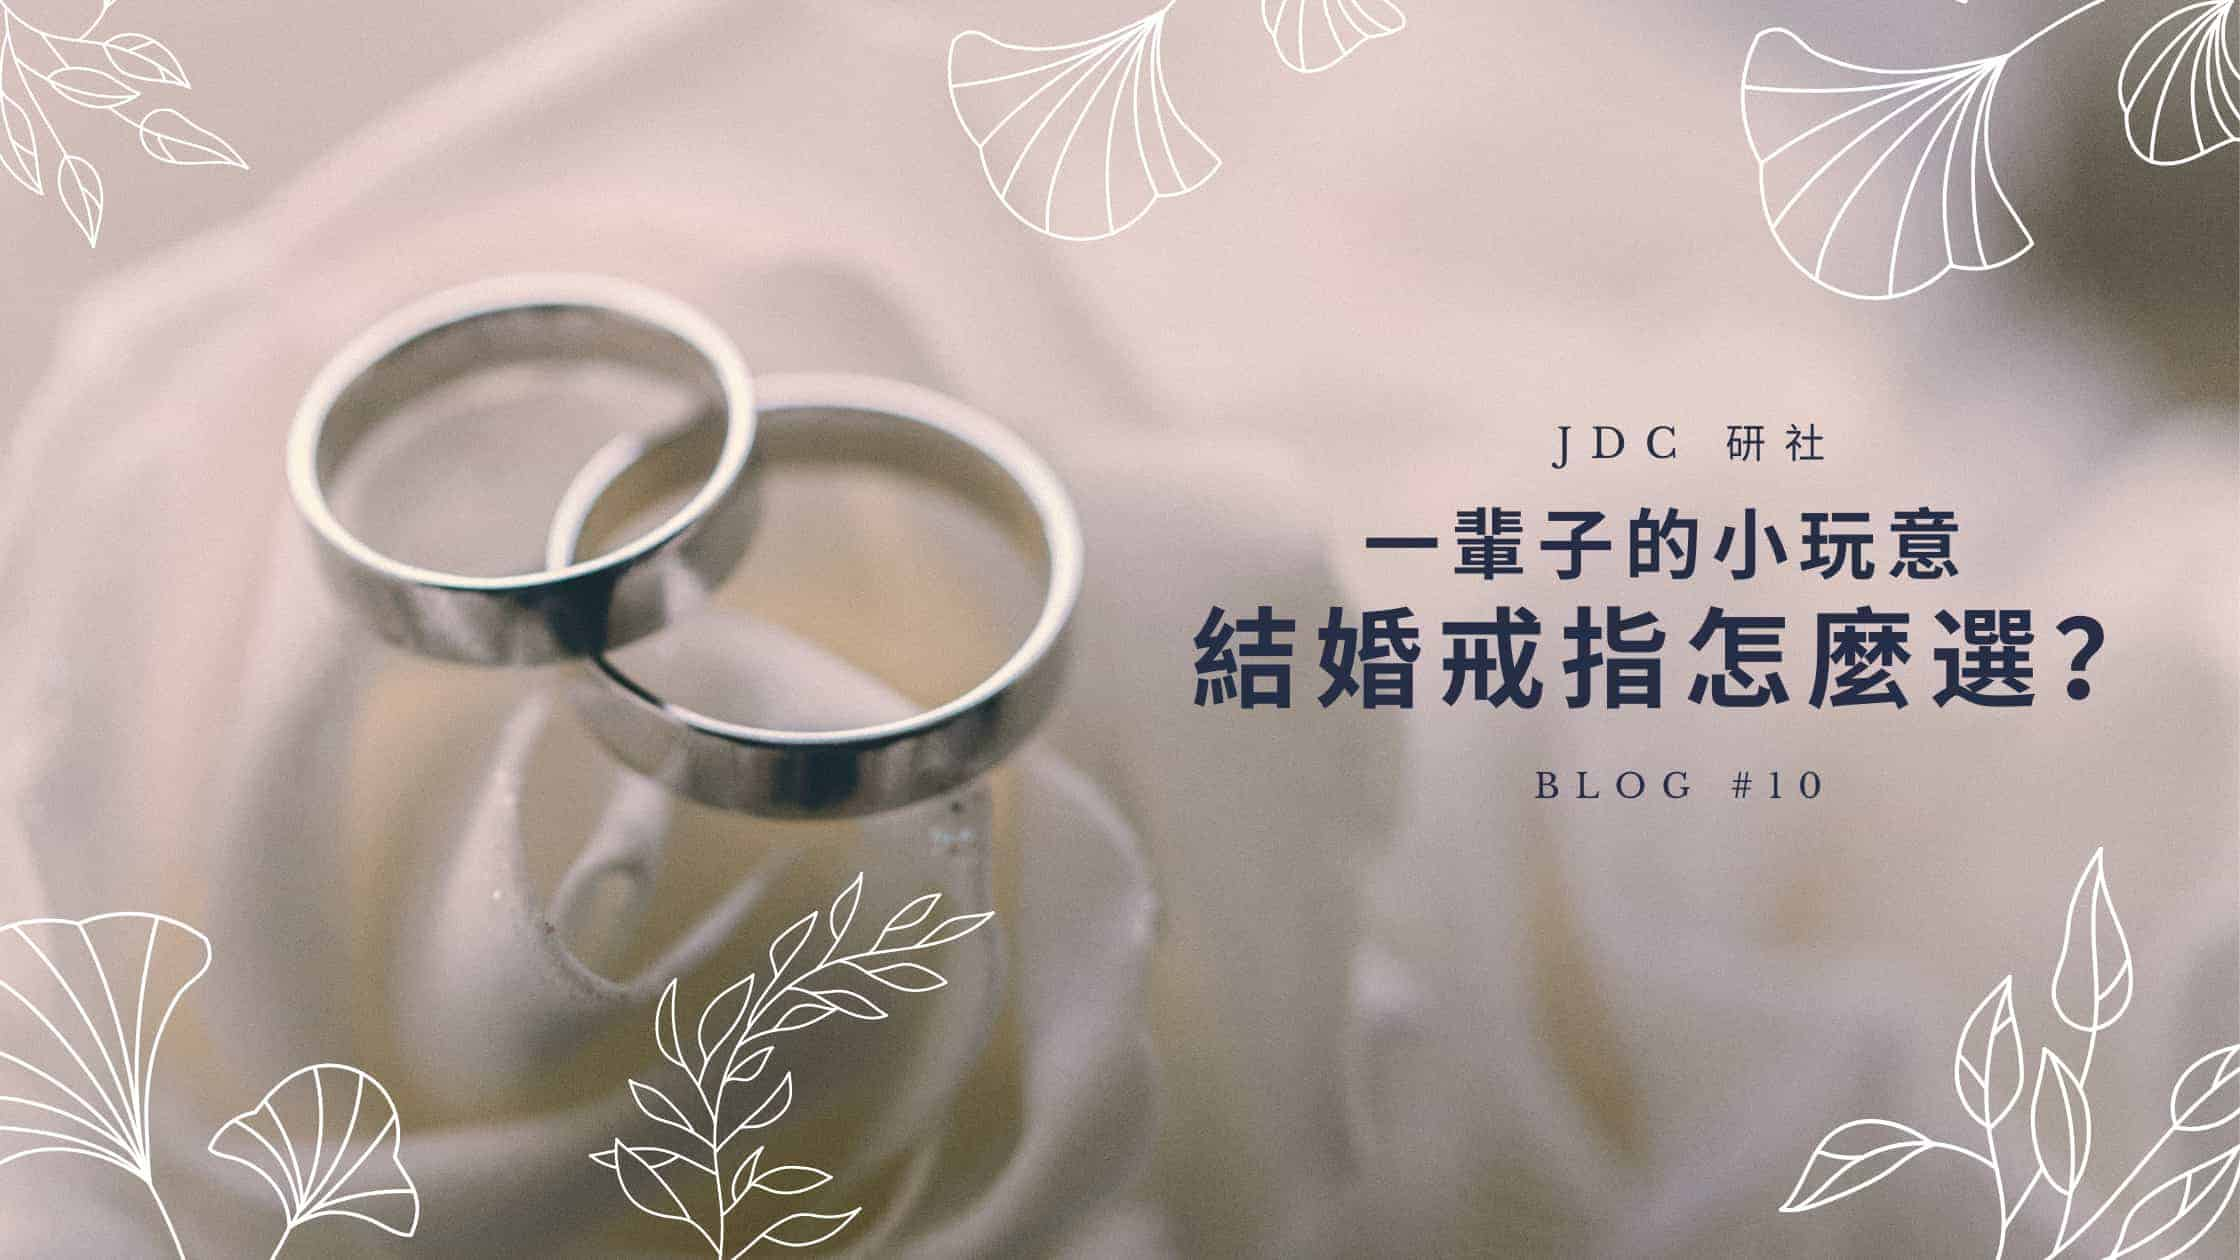 jdc blog 10